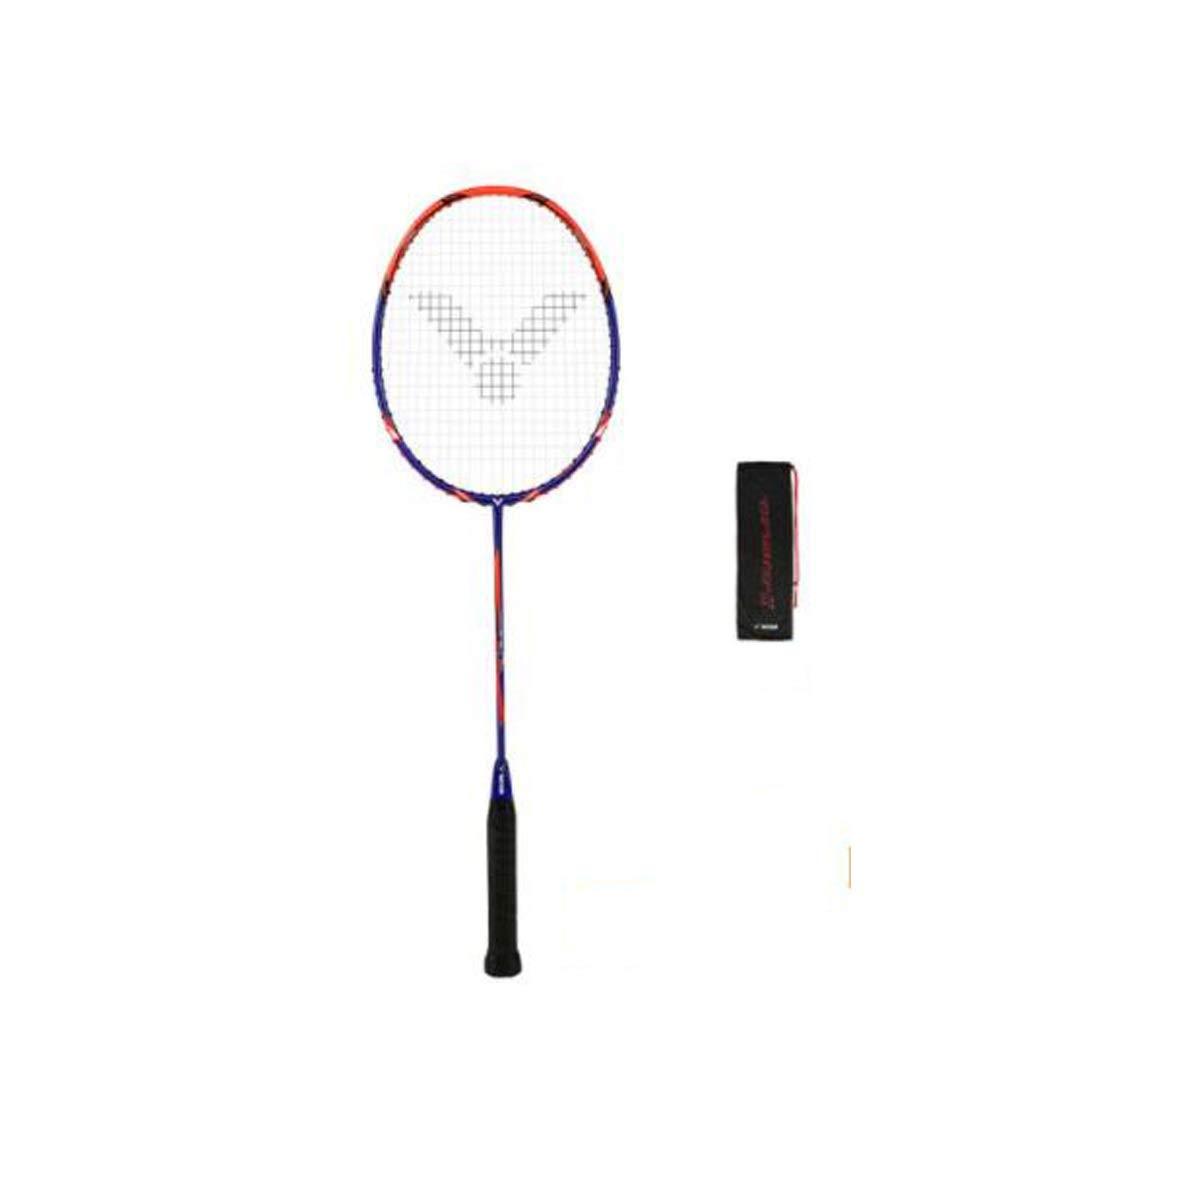 Tongboshi Badminton Racket, Training Level, Offensive, Carbon Fiber Badminton Racket, (deep Blue) Badminton Racket, (Color : Blue)